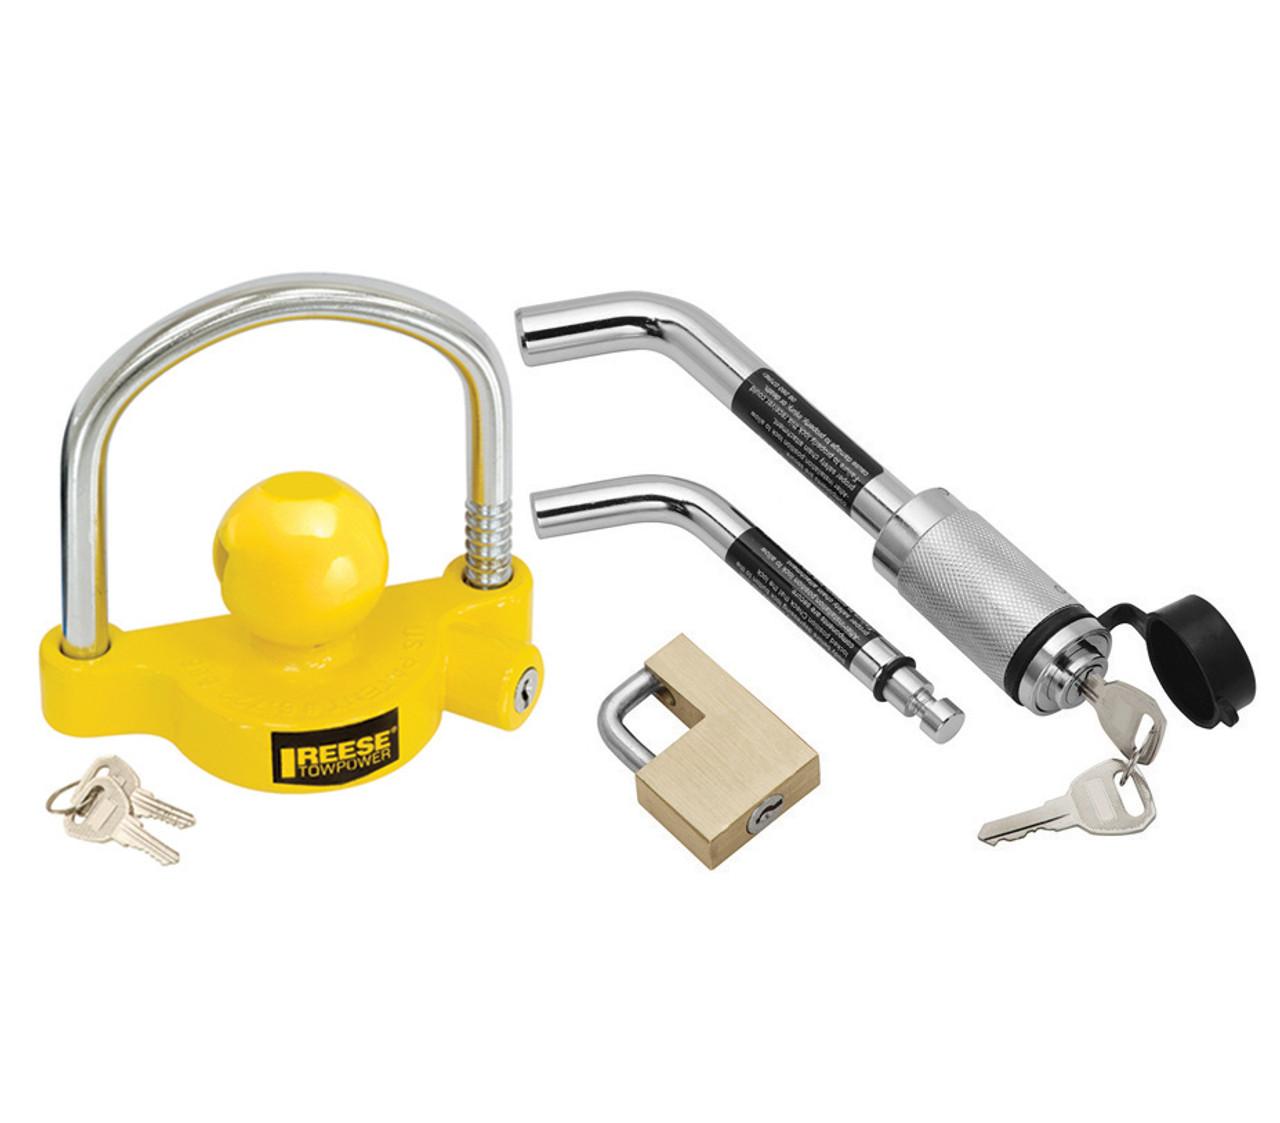 Ball Lock Lift : Trailer coupler and hitch lock keyed alike kit